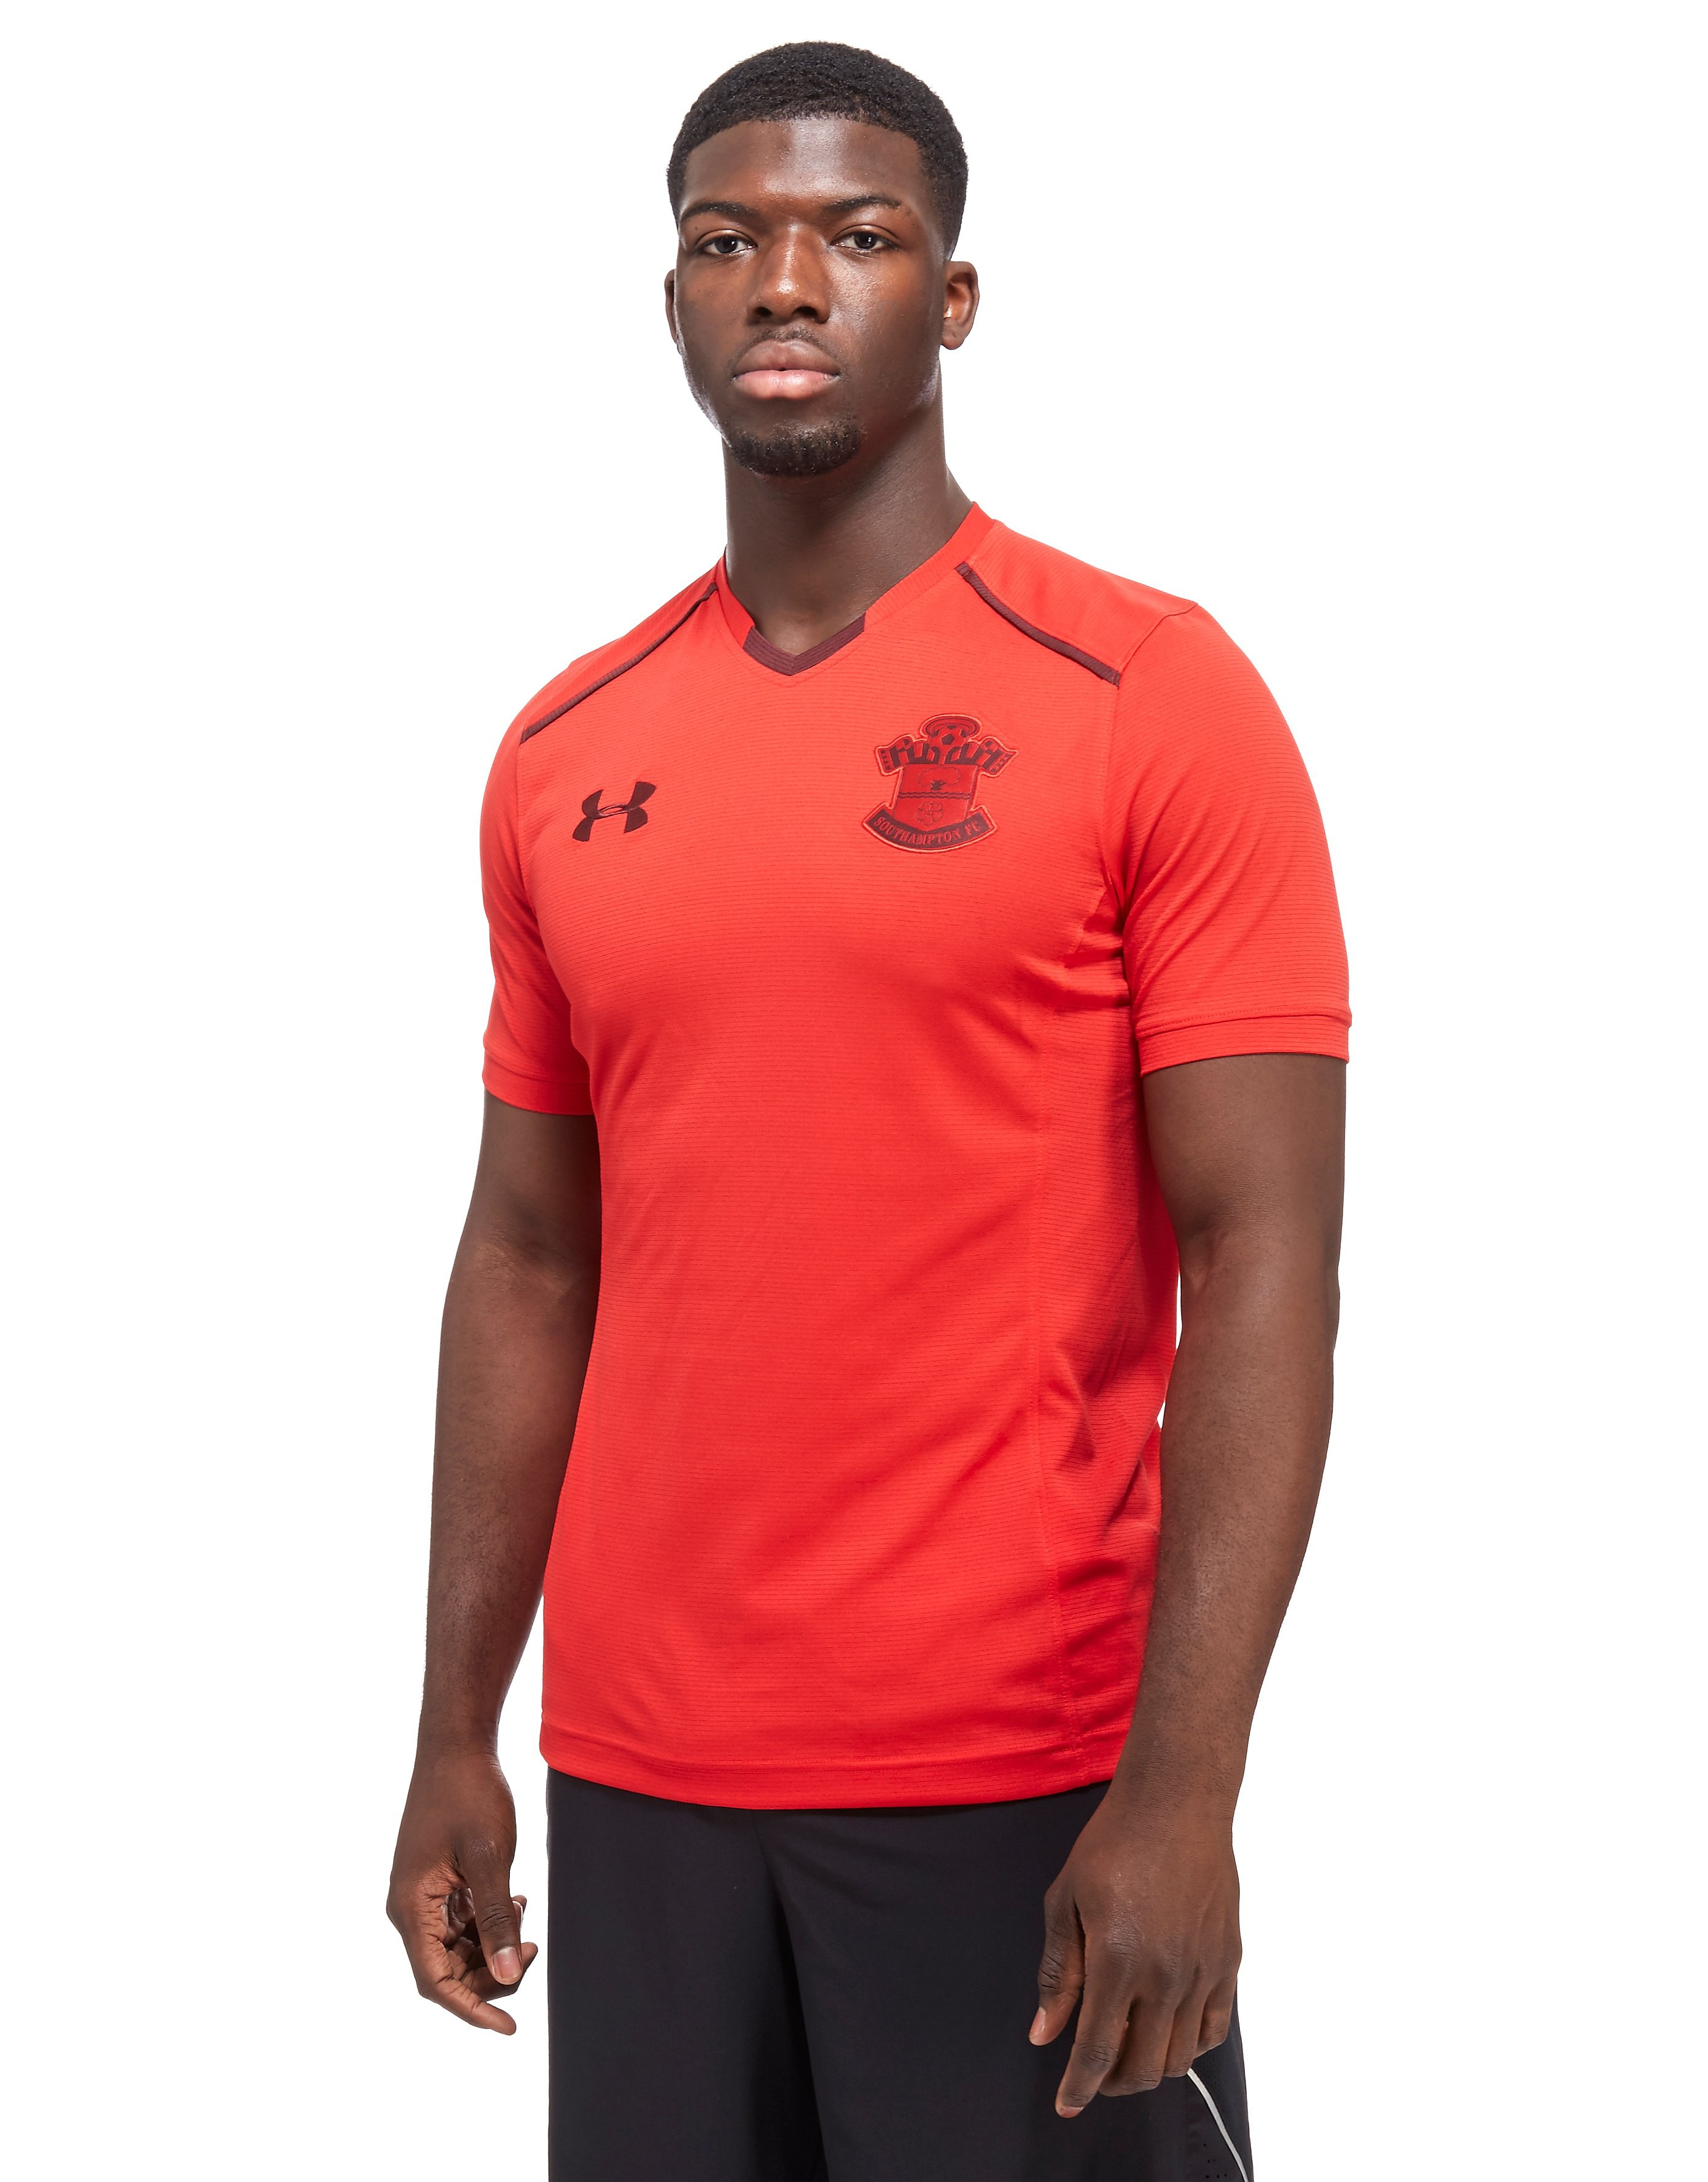 Under Armour Southampton FC 2017 Training T-Shirt